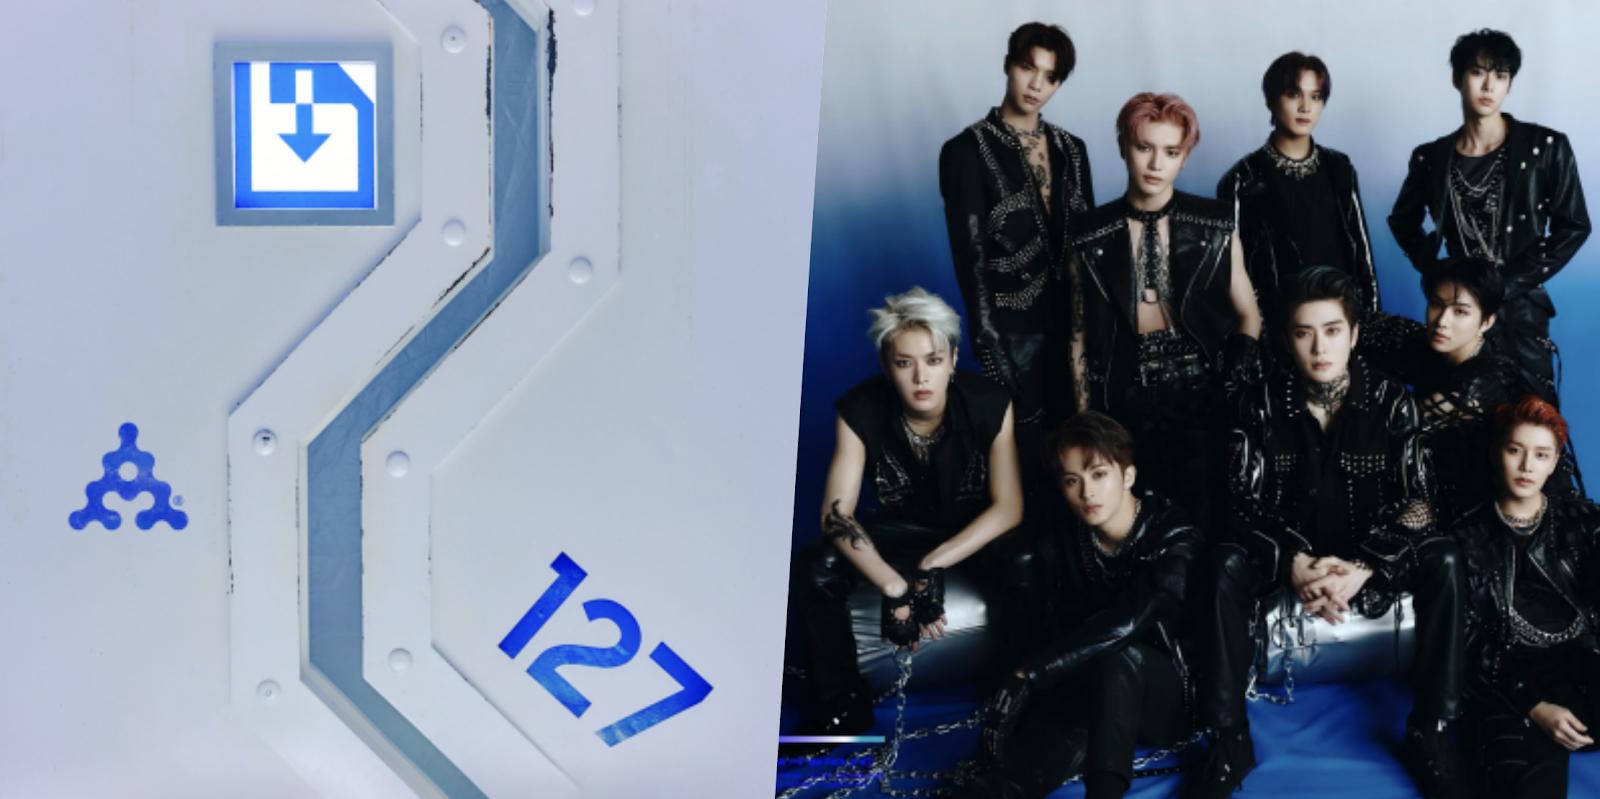 NCT 127 presentará SAVE en colaboración con Amoeba Culture